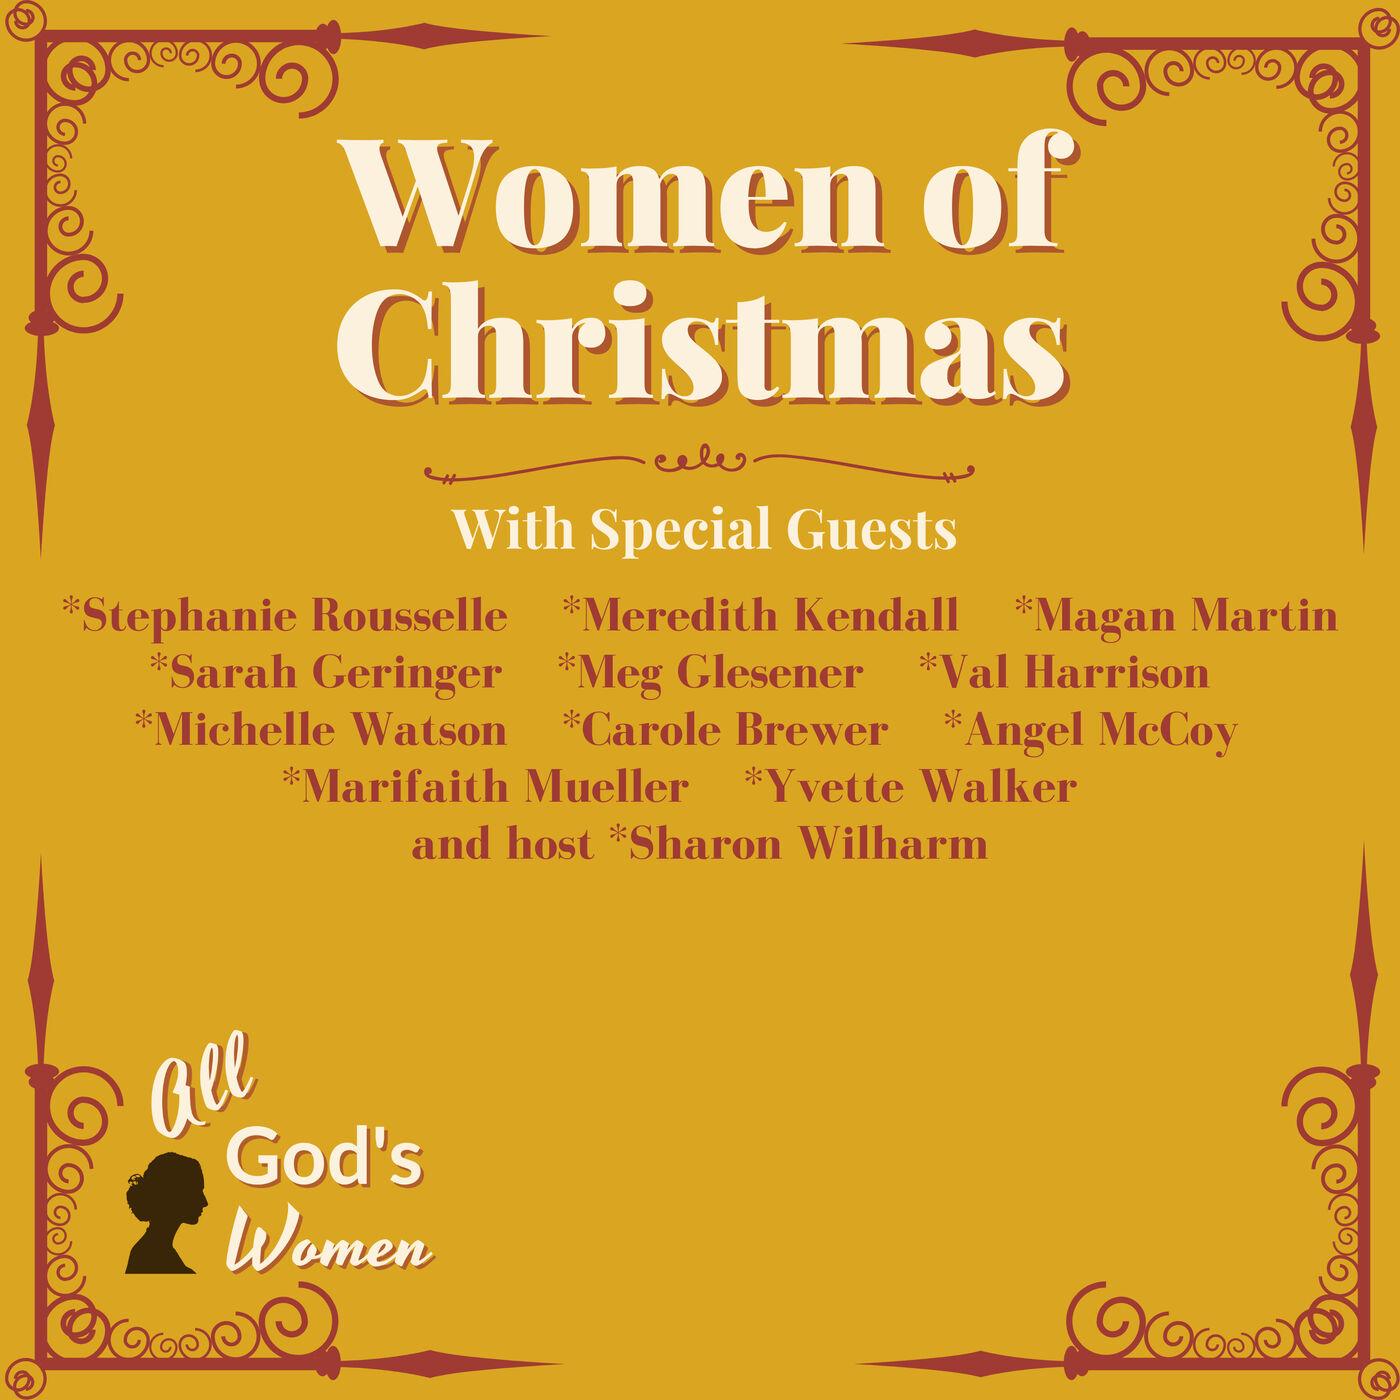 Women of Christmas Crosscast Episode Trailer